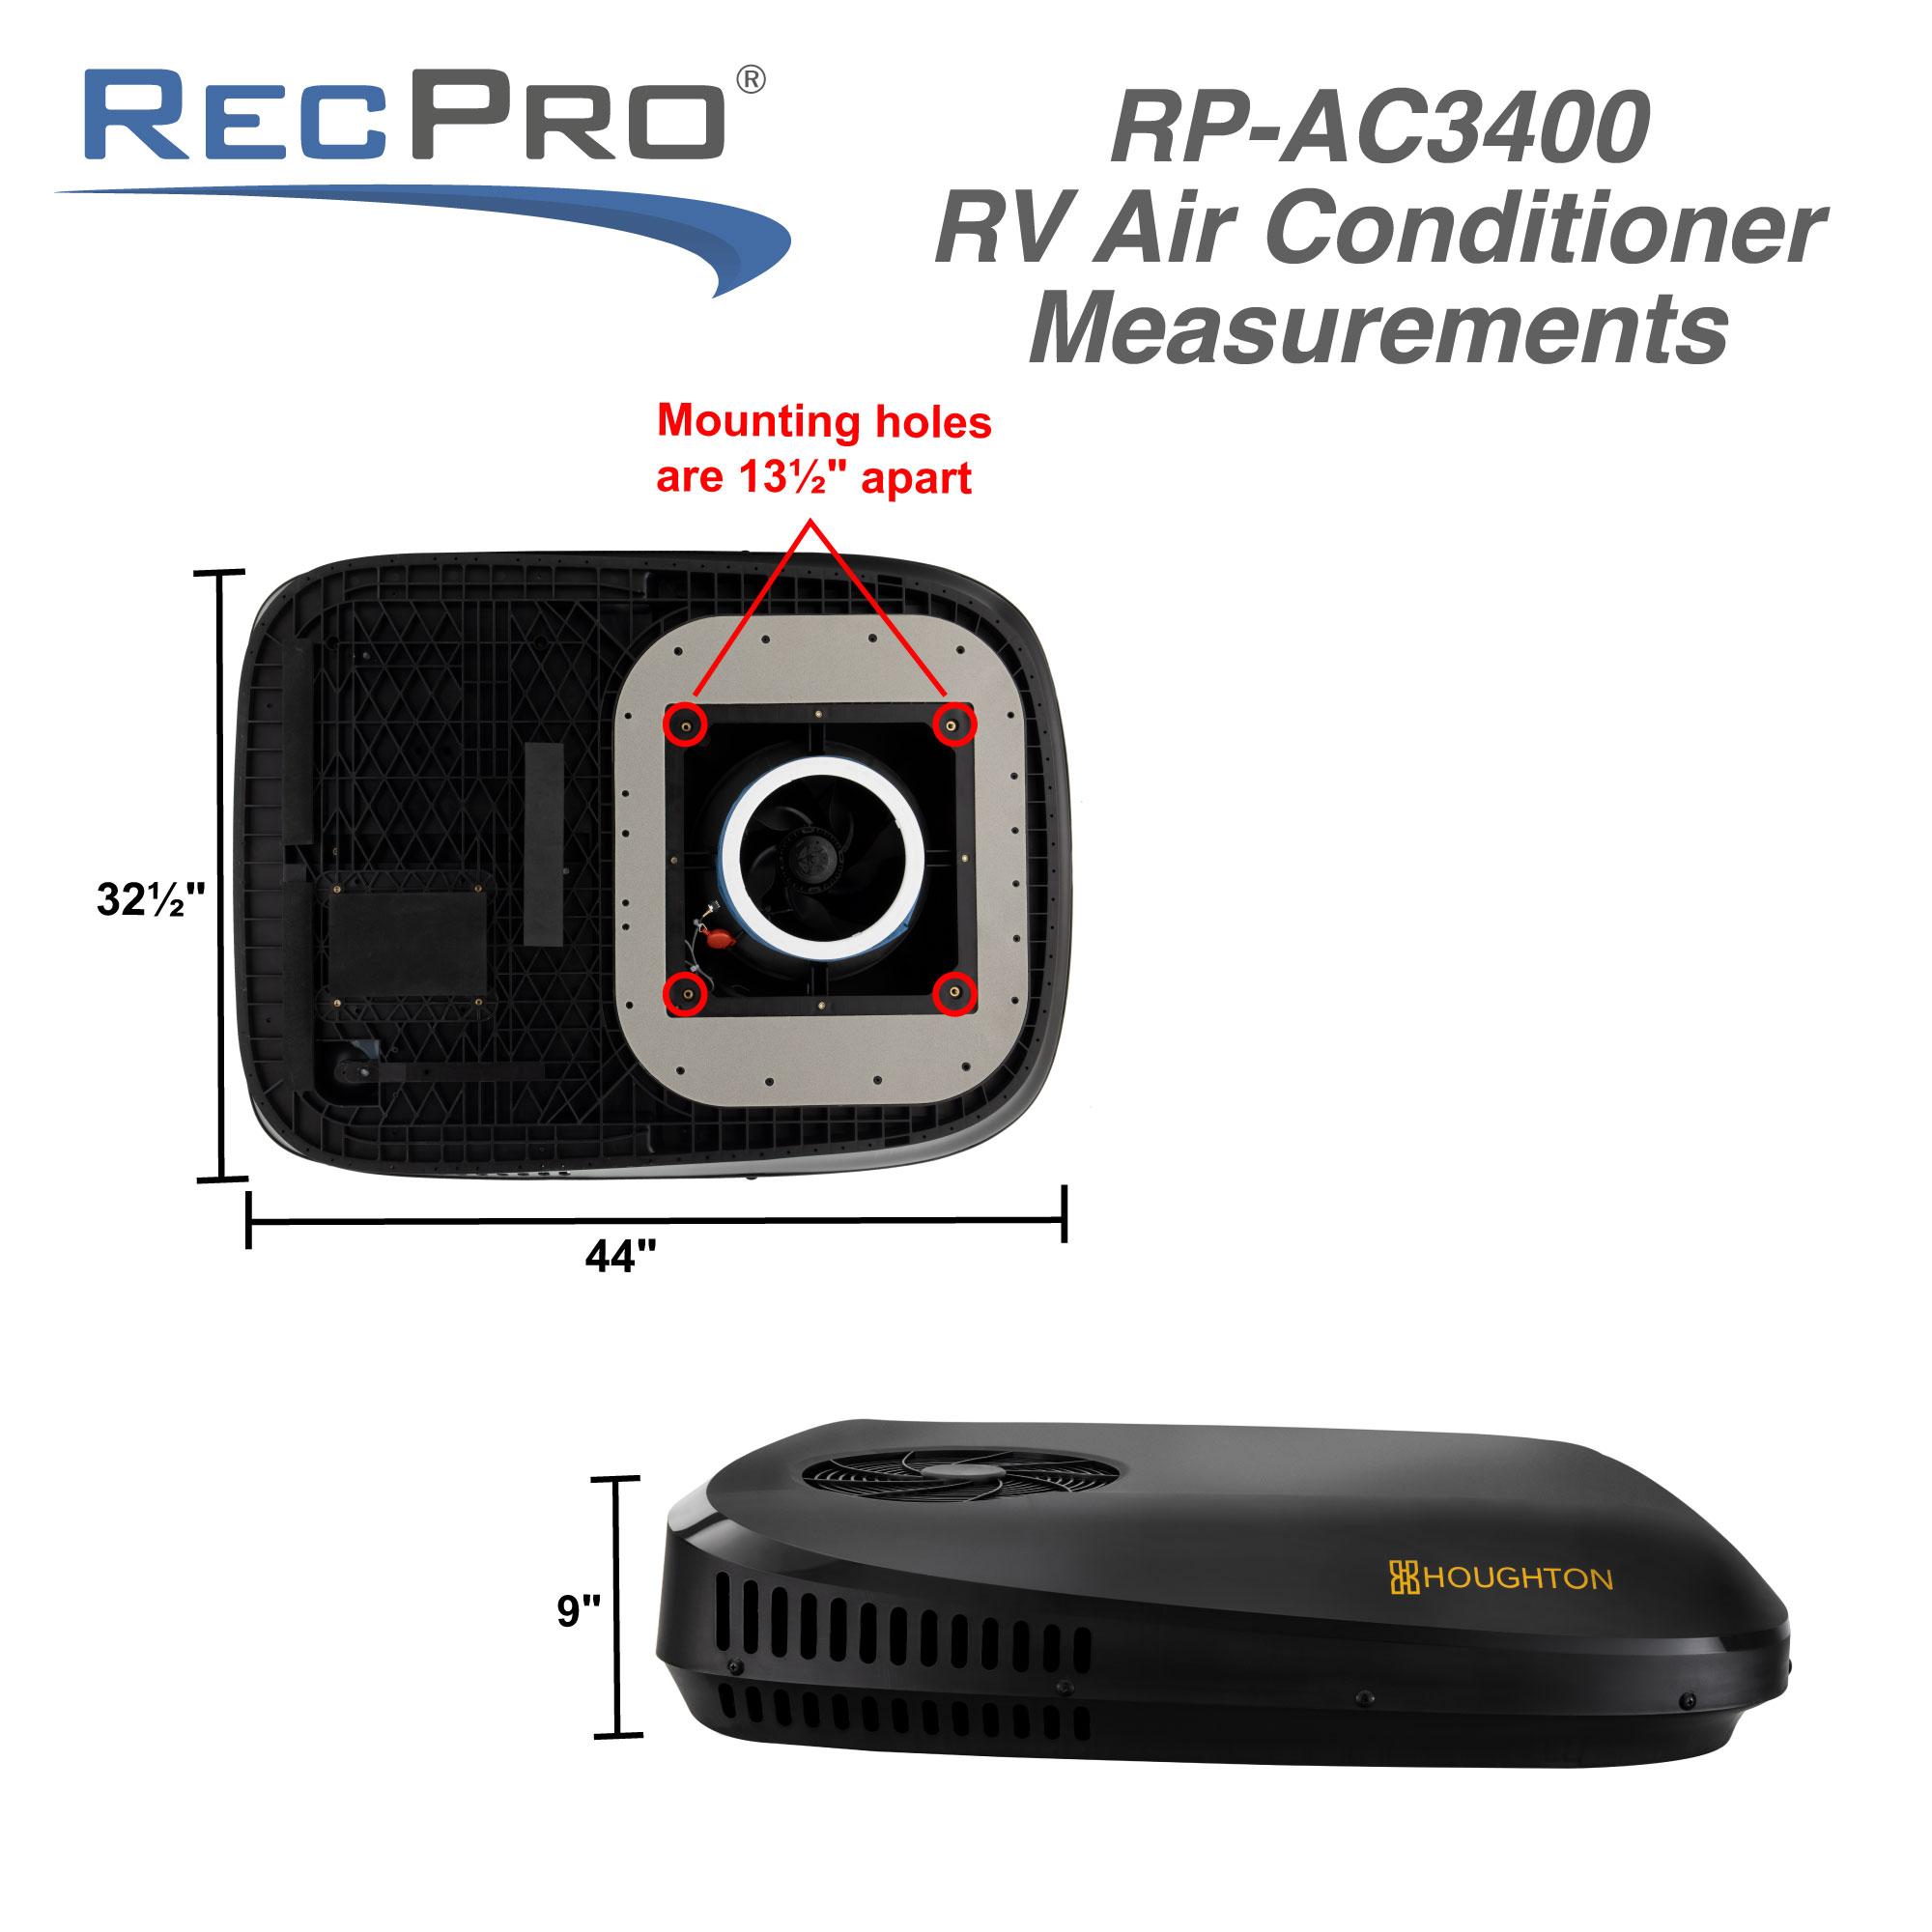 RV Air Conditioner 13.5K Quiet AC with Remote Control